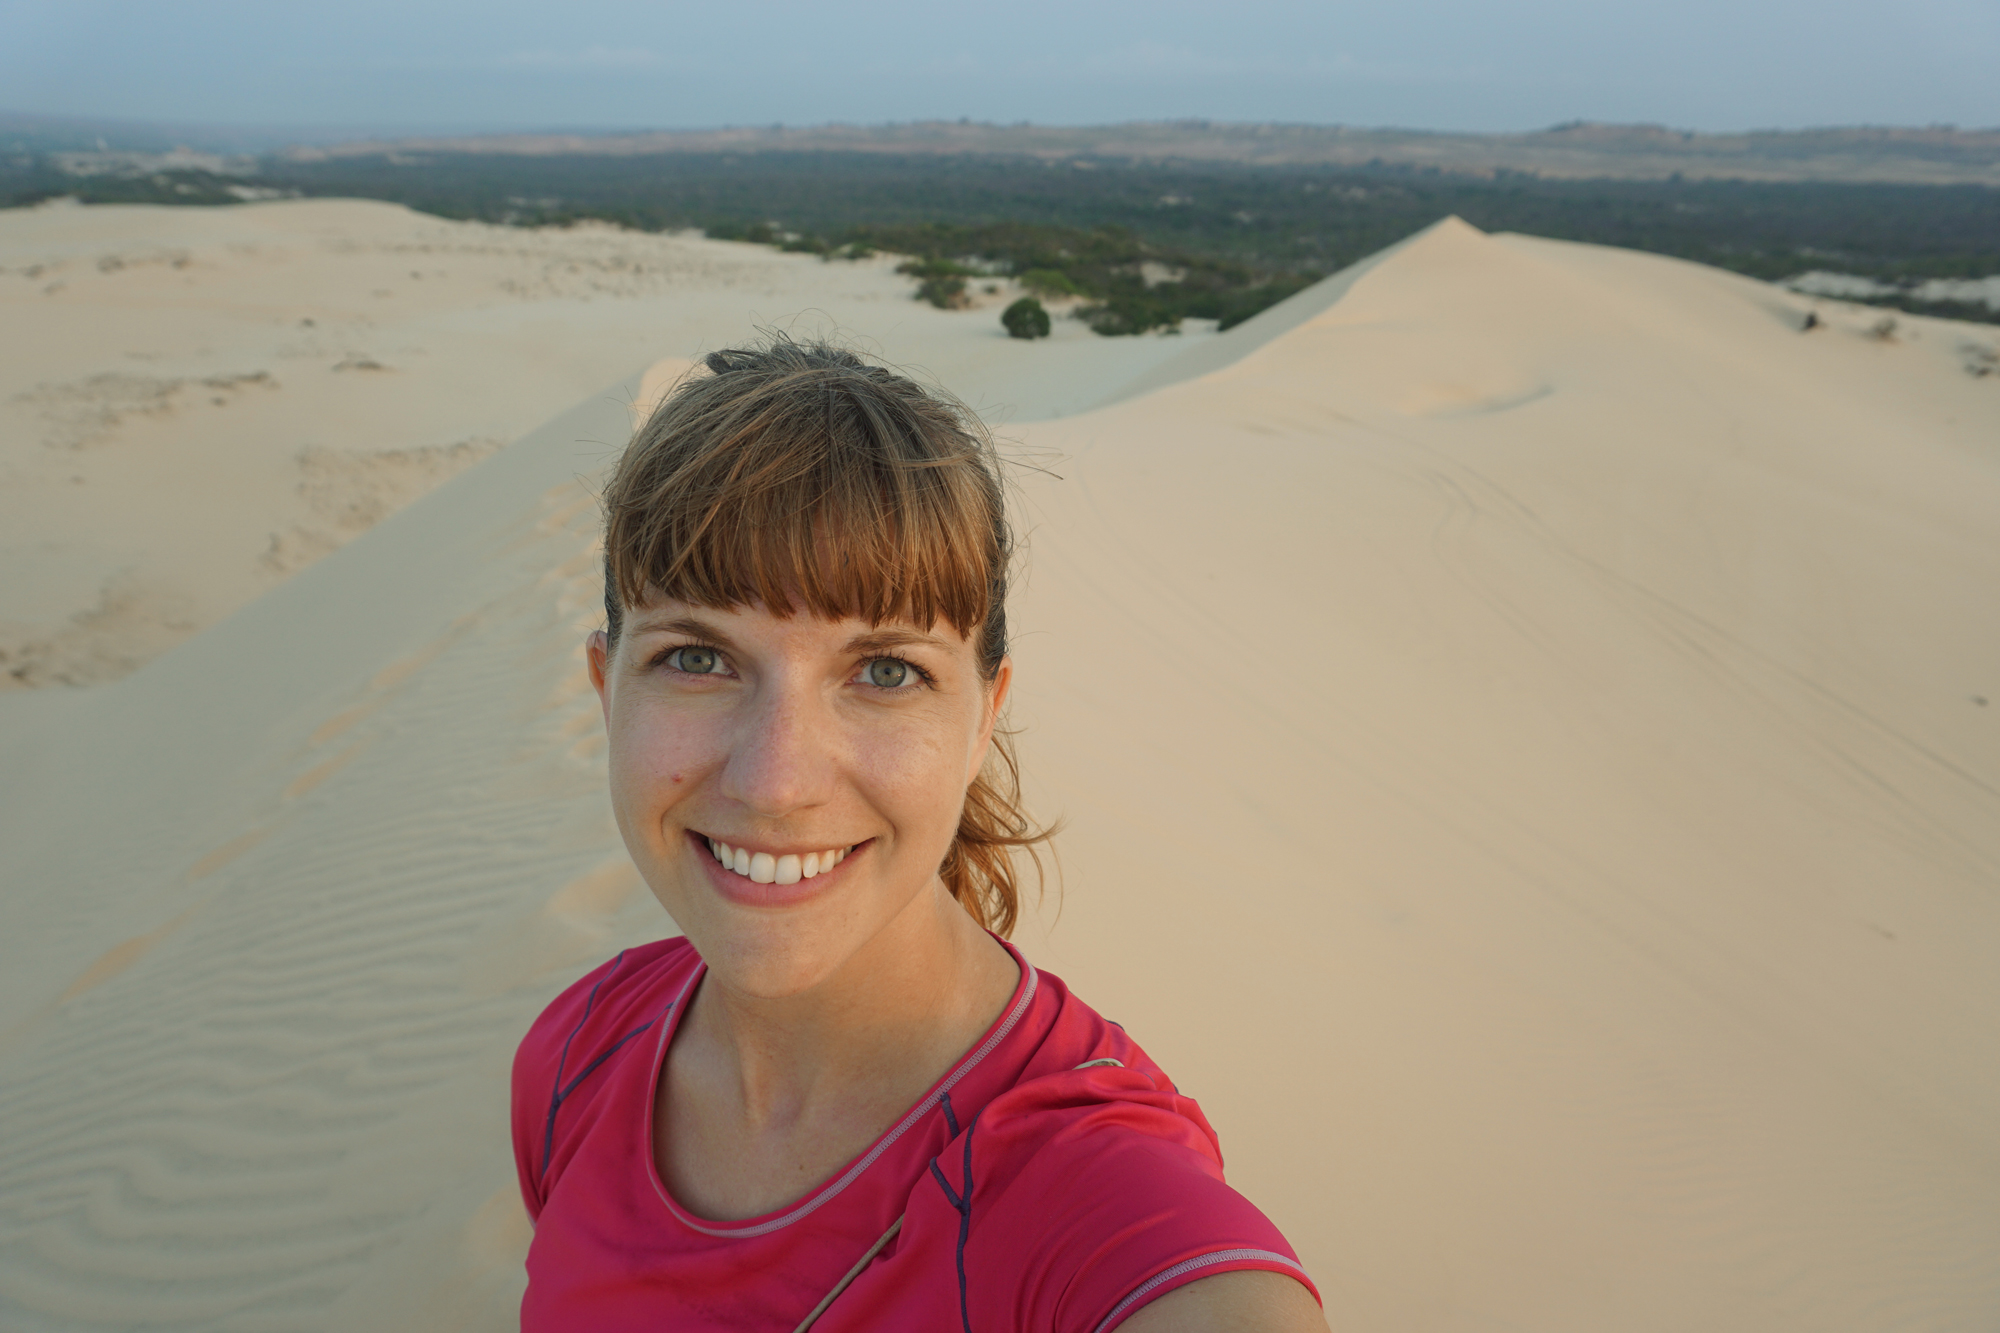 Sunrise at the sand dunes, Mui Ne